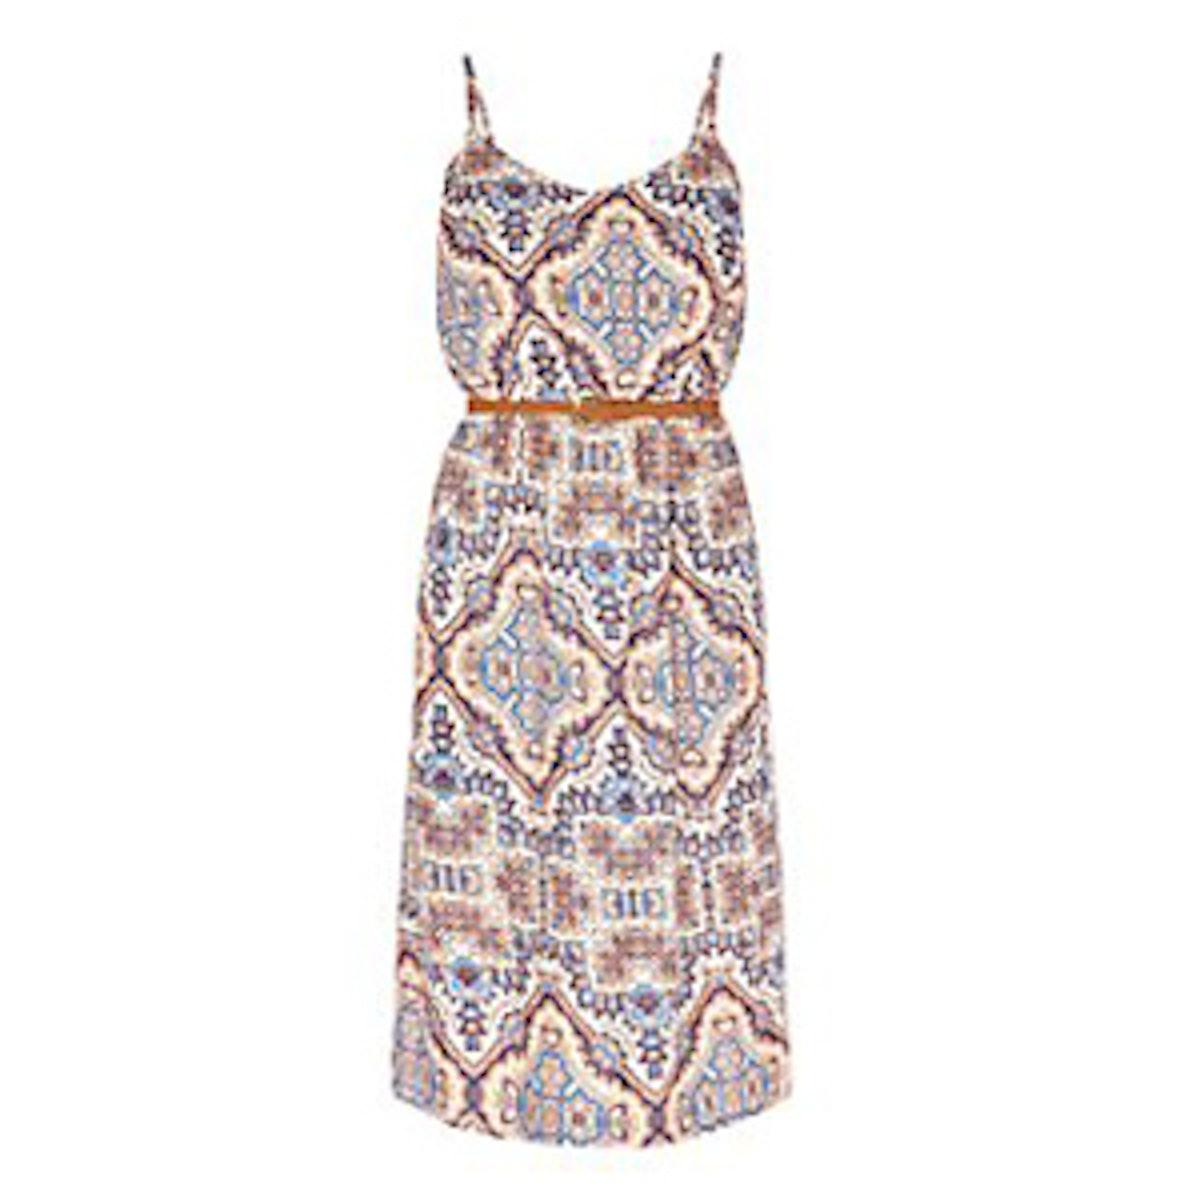 Floral Tile Midi Dress